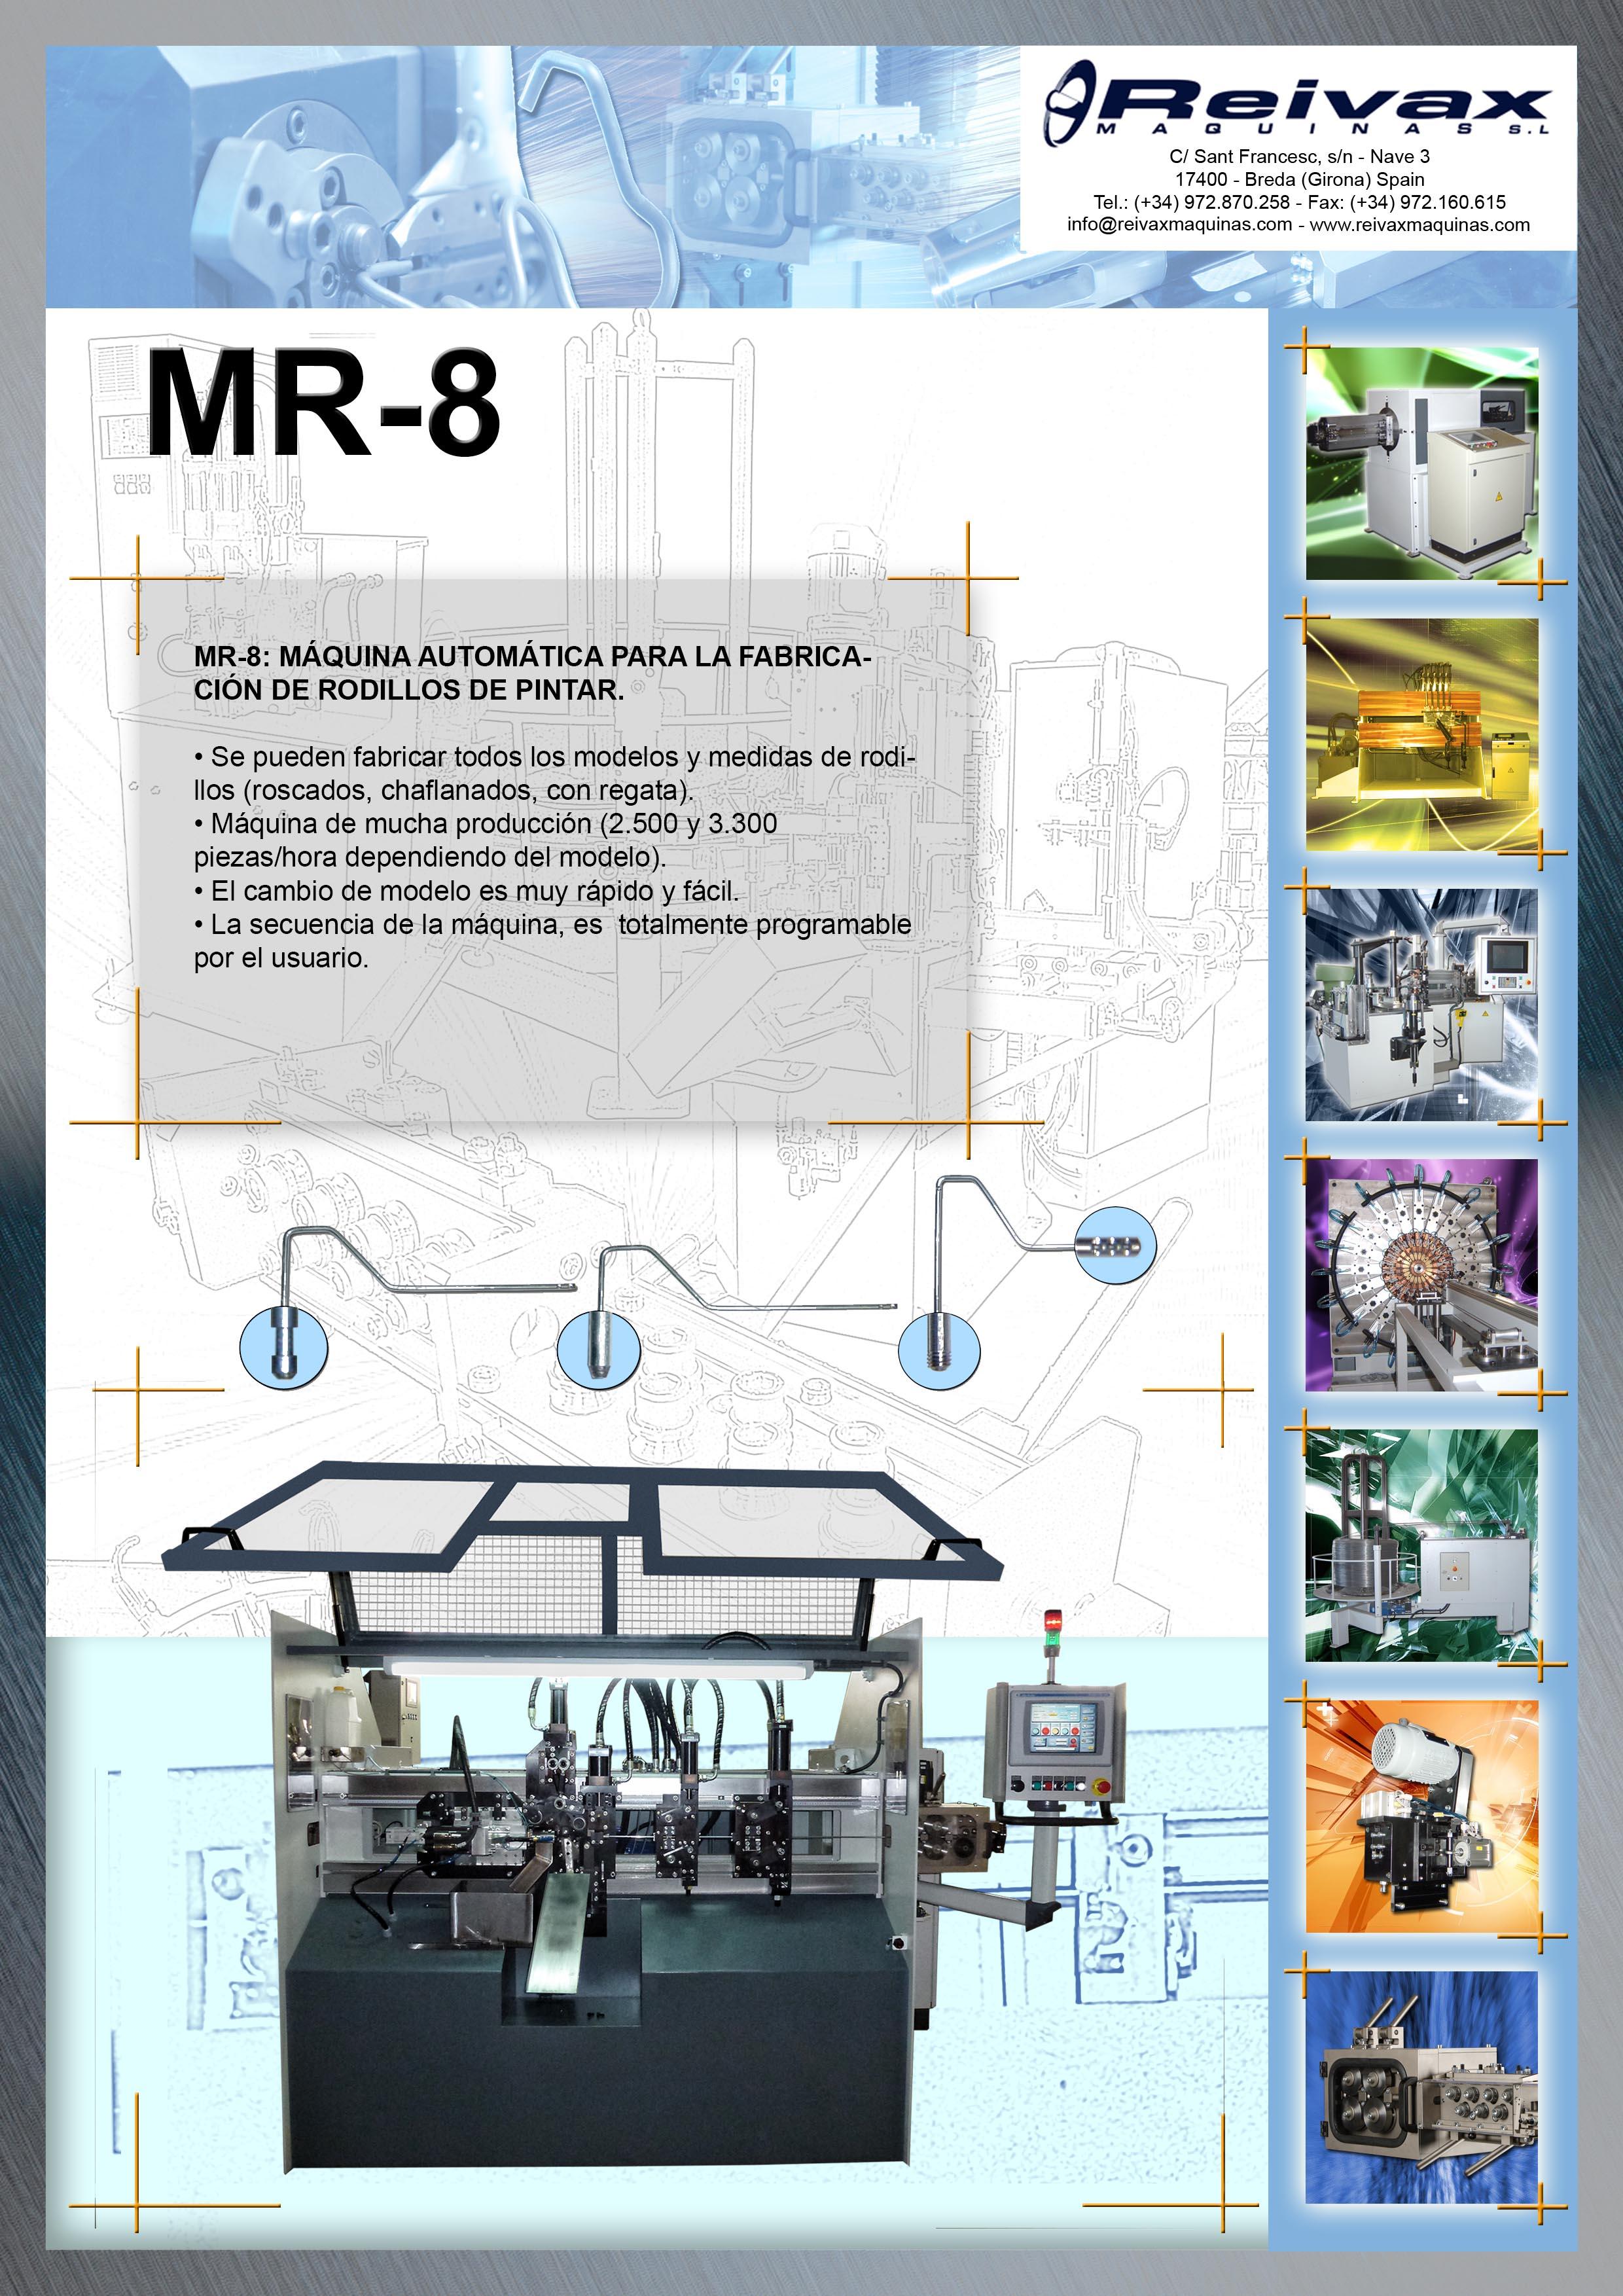 ReivaxMaquinas: Ficha Tecnica MR-8